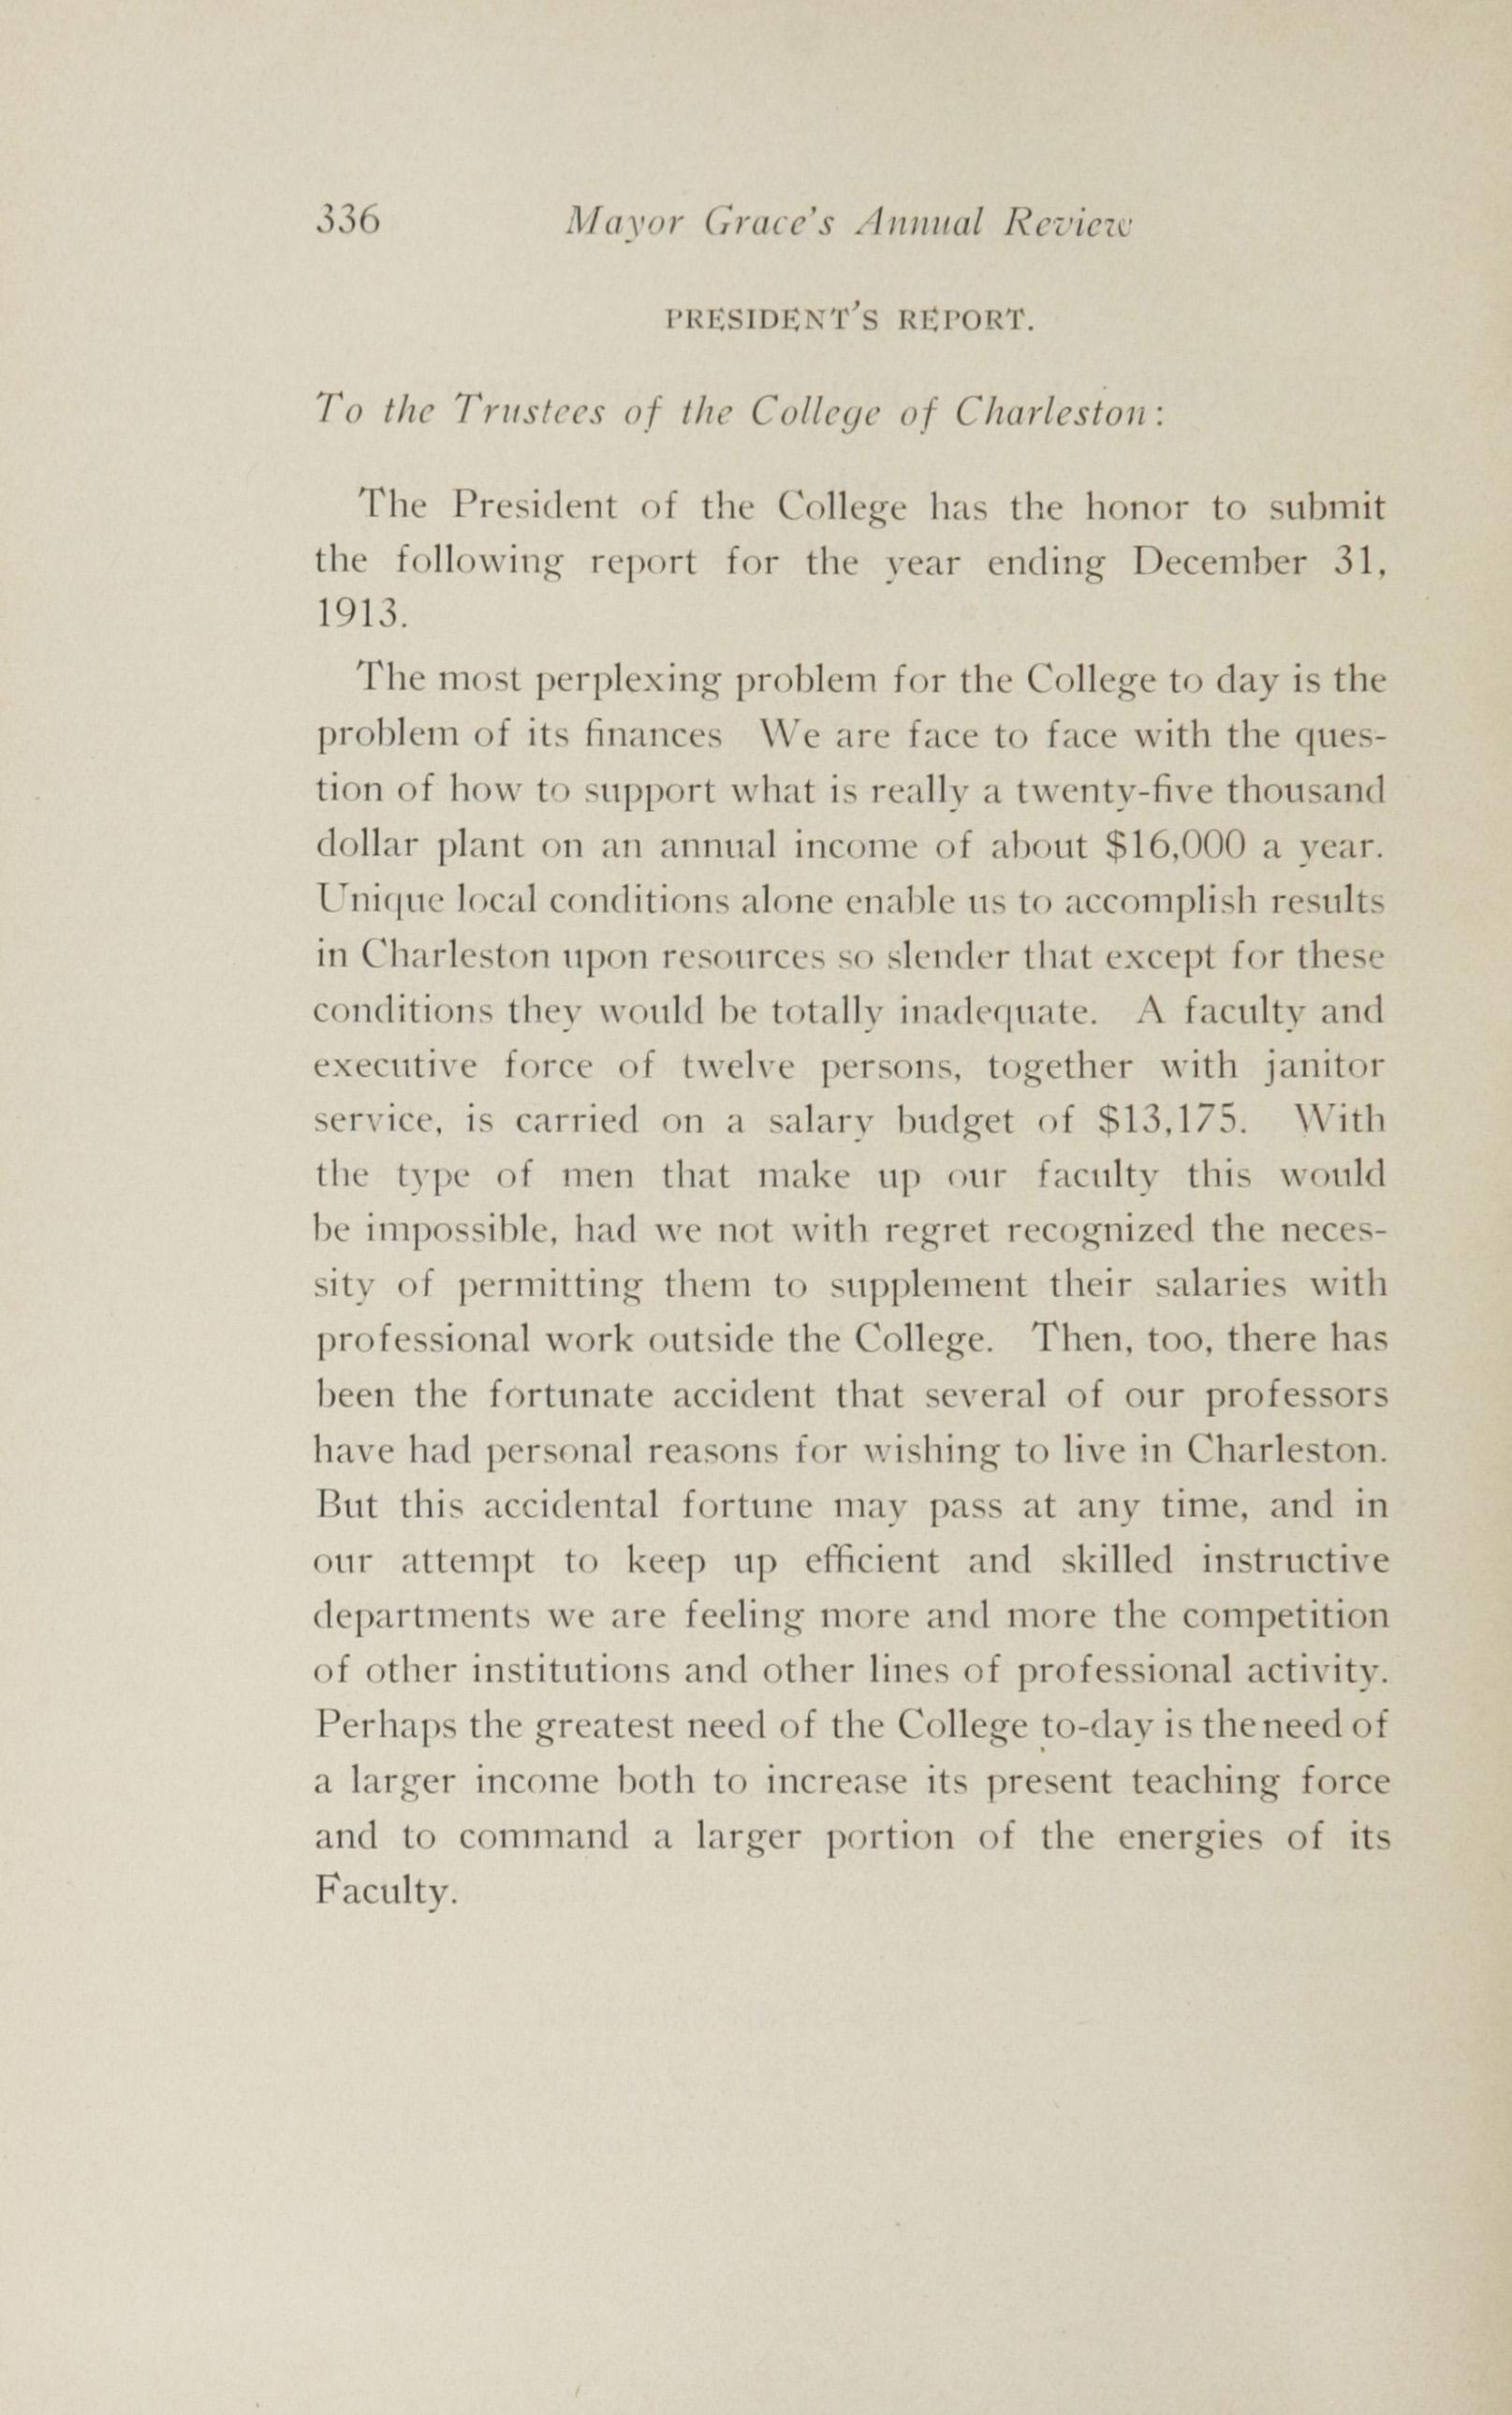 Charleston Yearbook, 1913, page 336